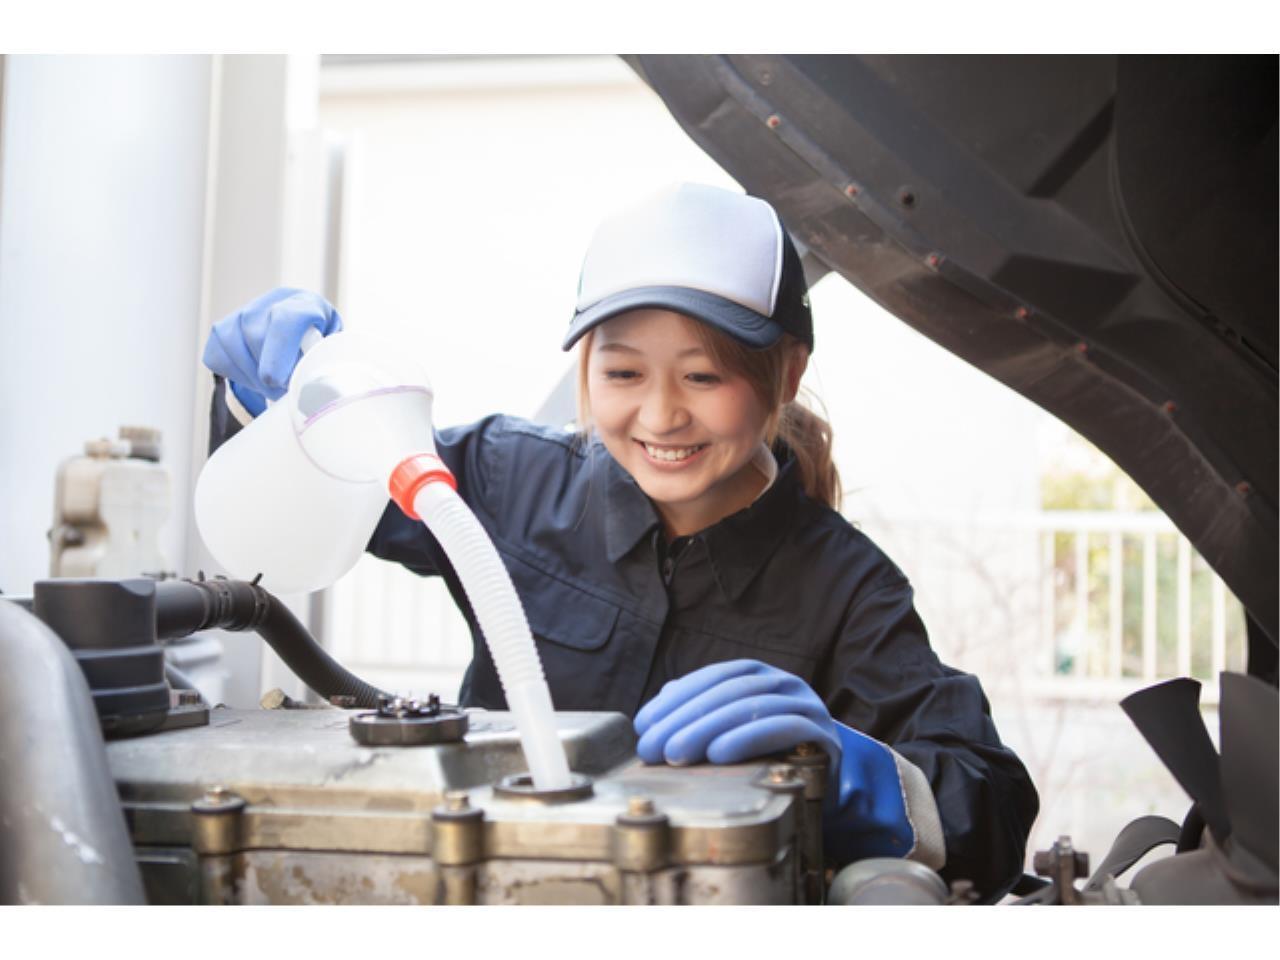 輸入車専門店での自動車整備